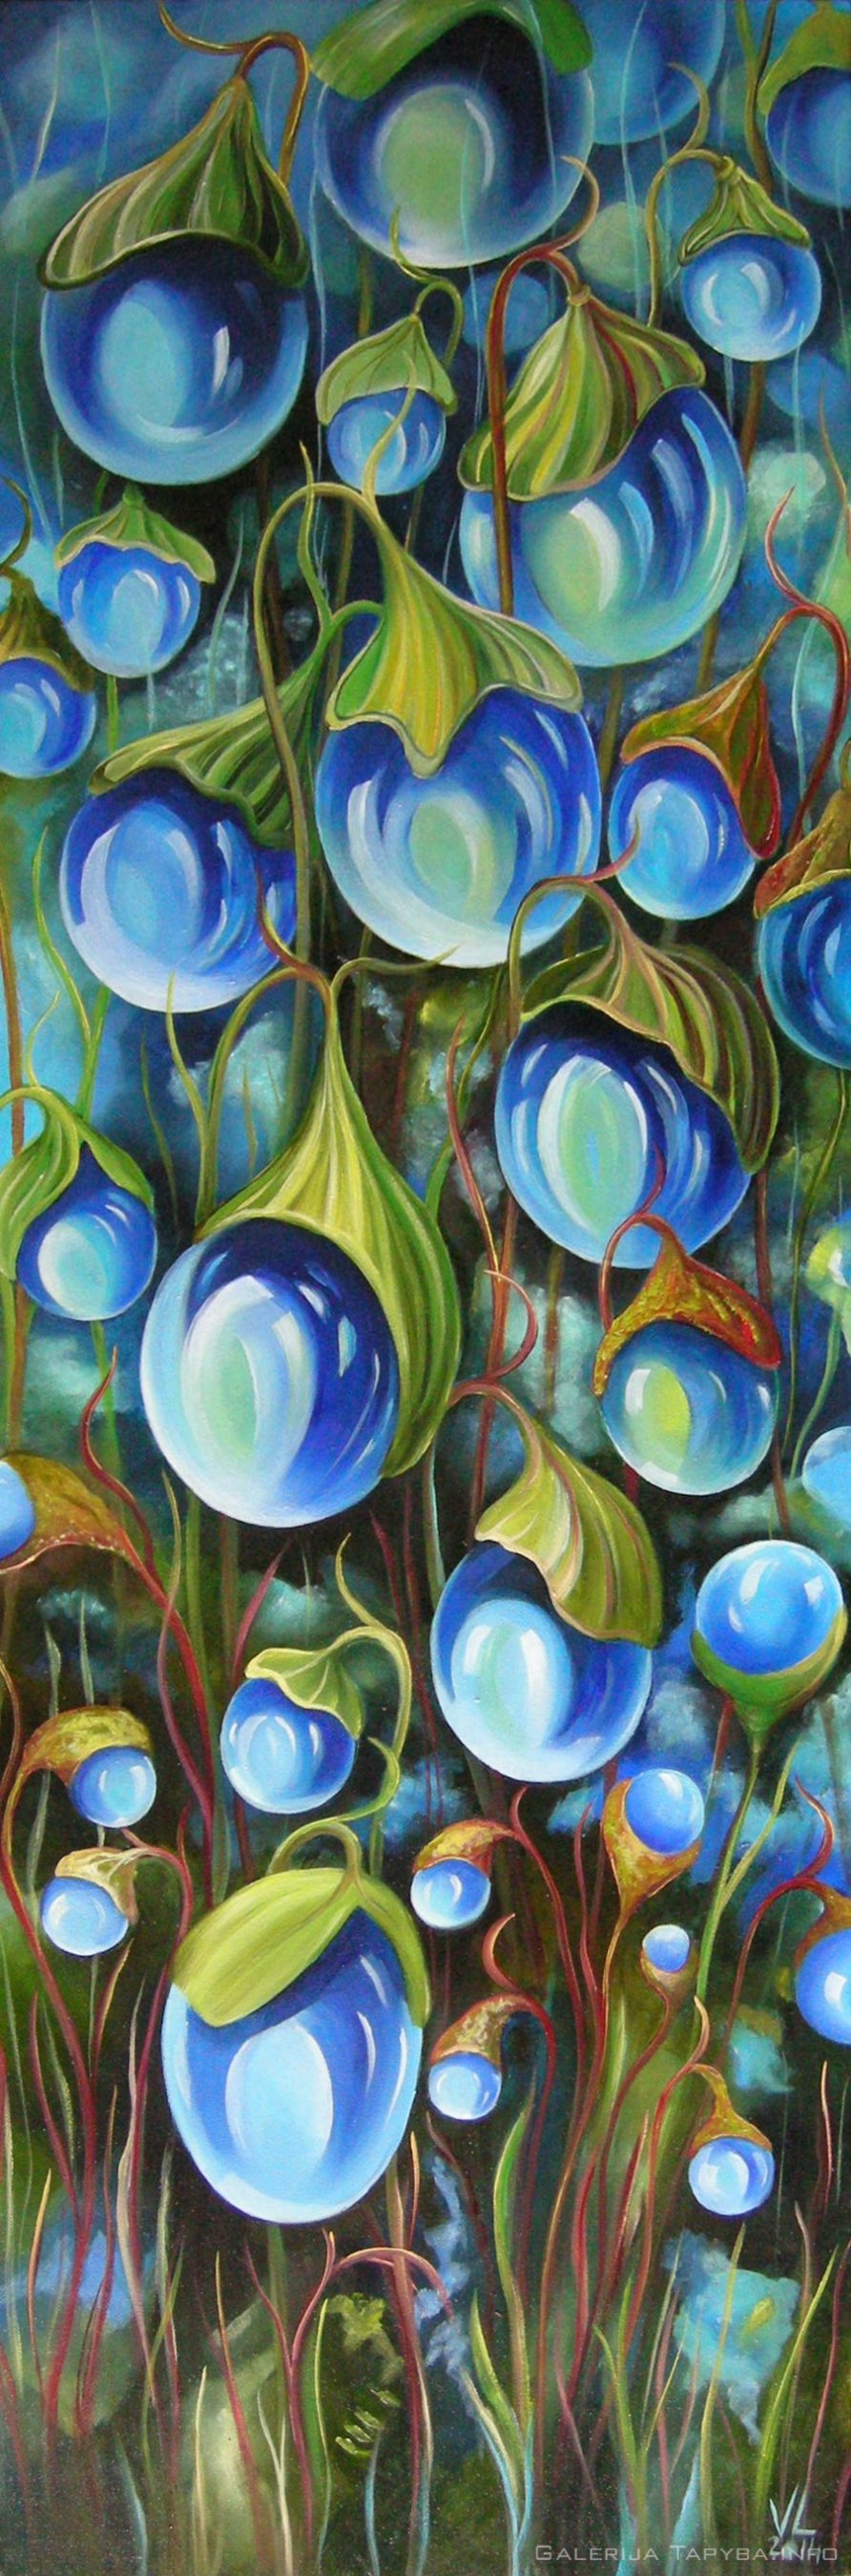 Mėlyni lašai